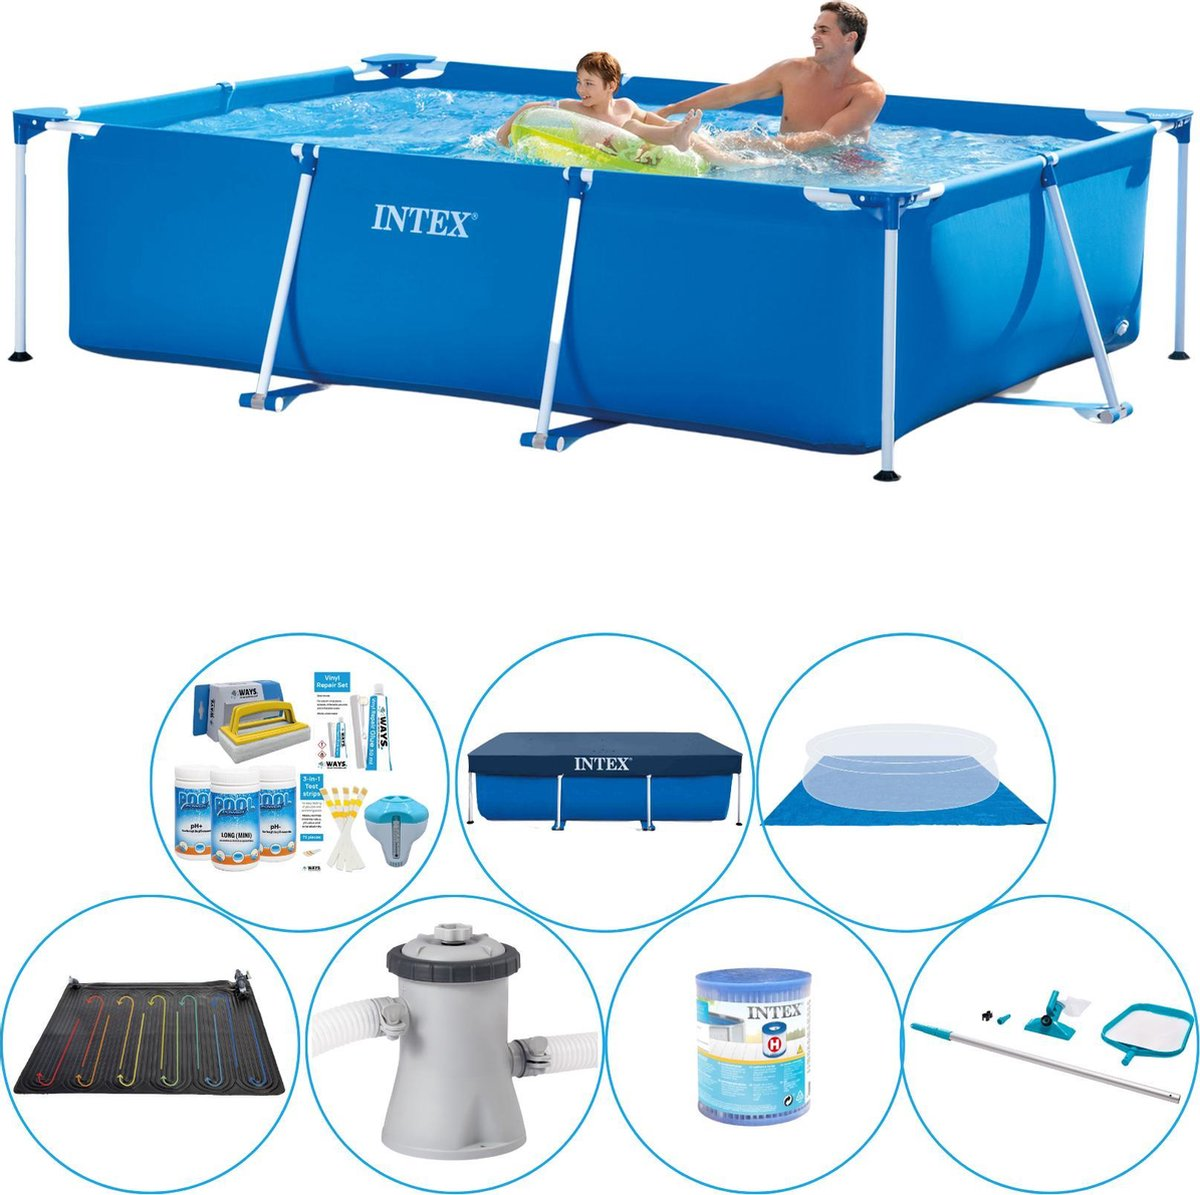 Intex Frame Pool Zwembad Super Deal - 260 x 160 x 65 cm